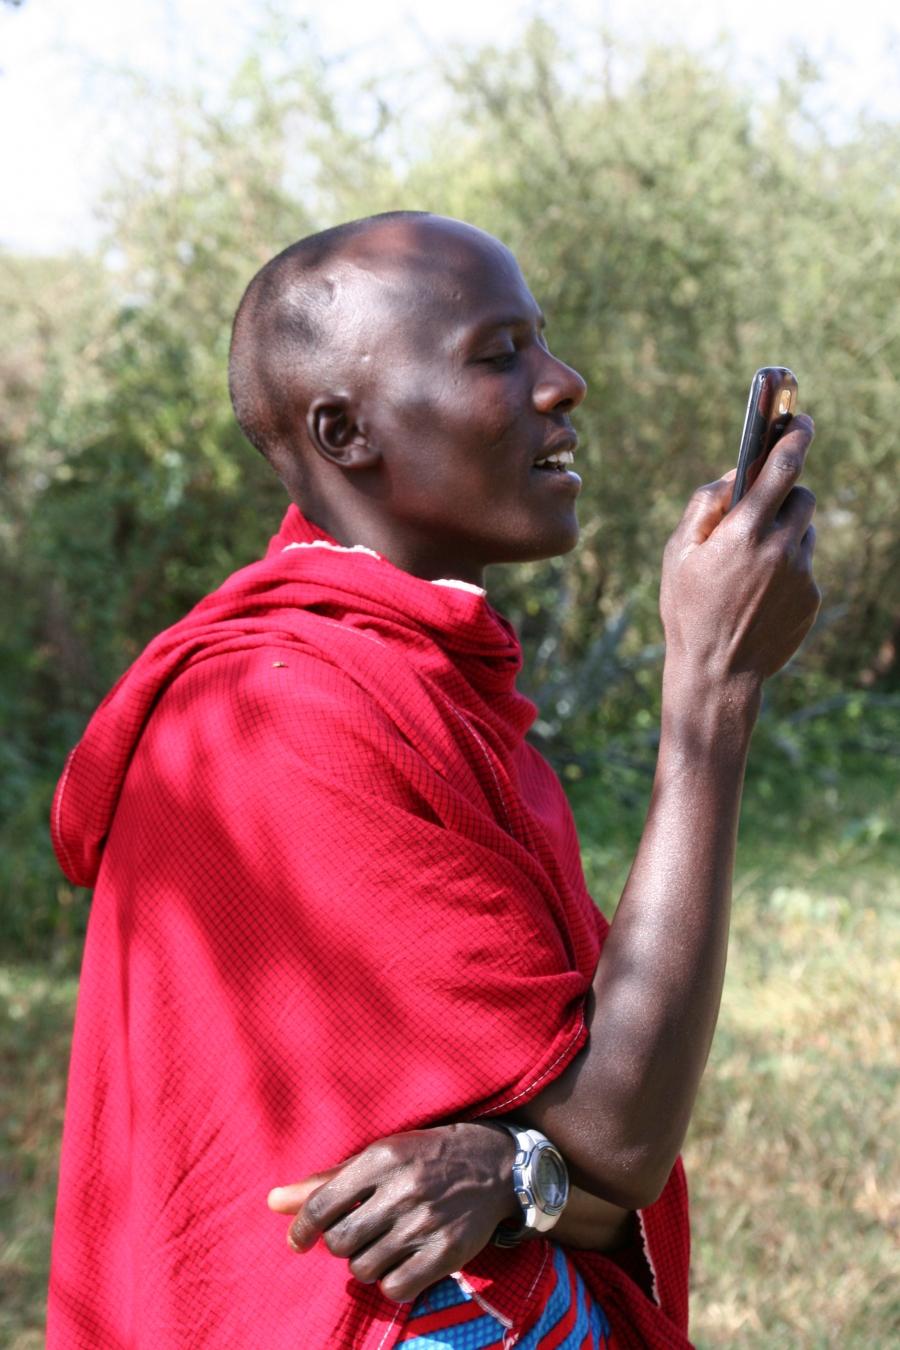 A Maasai man checks the number of an incoming call.